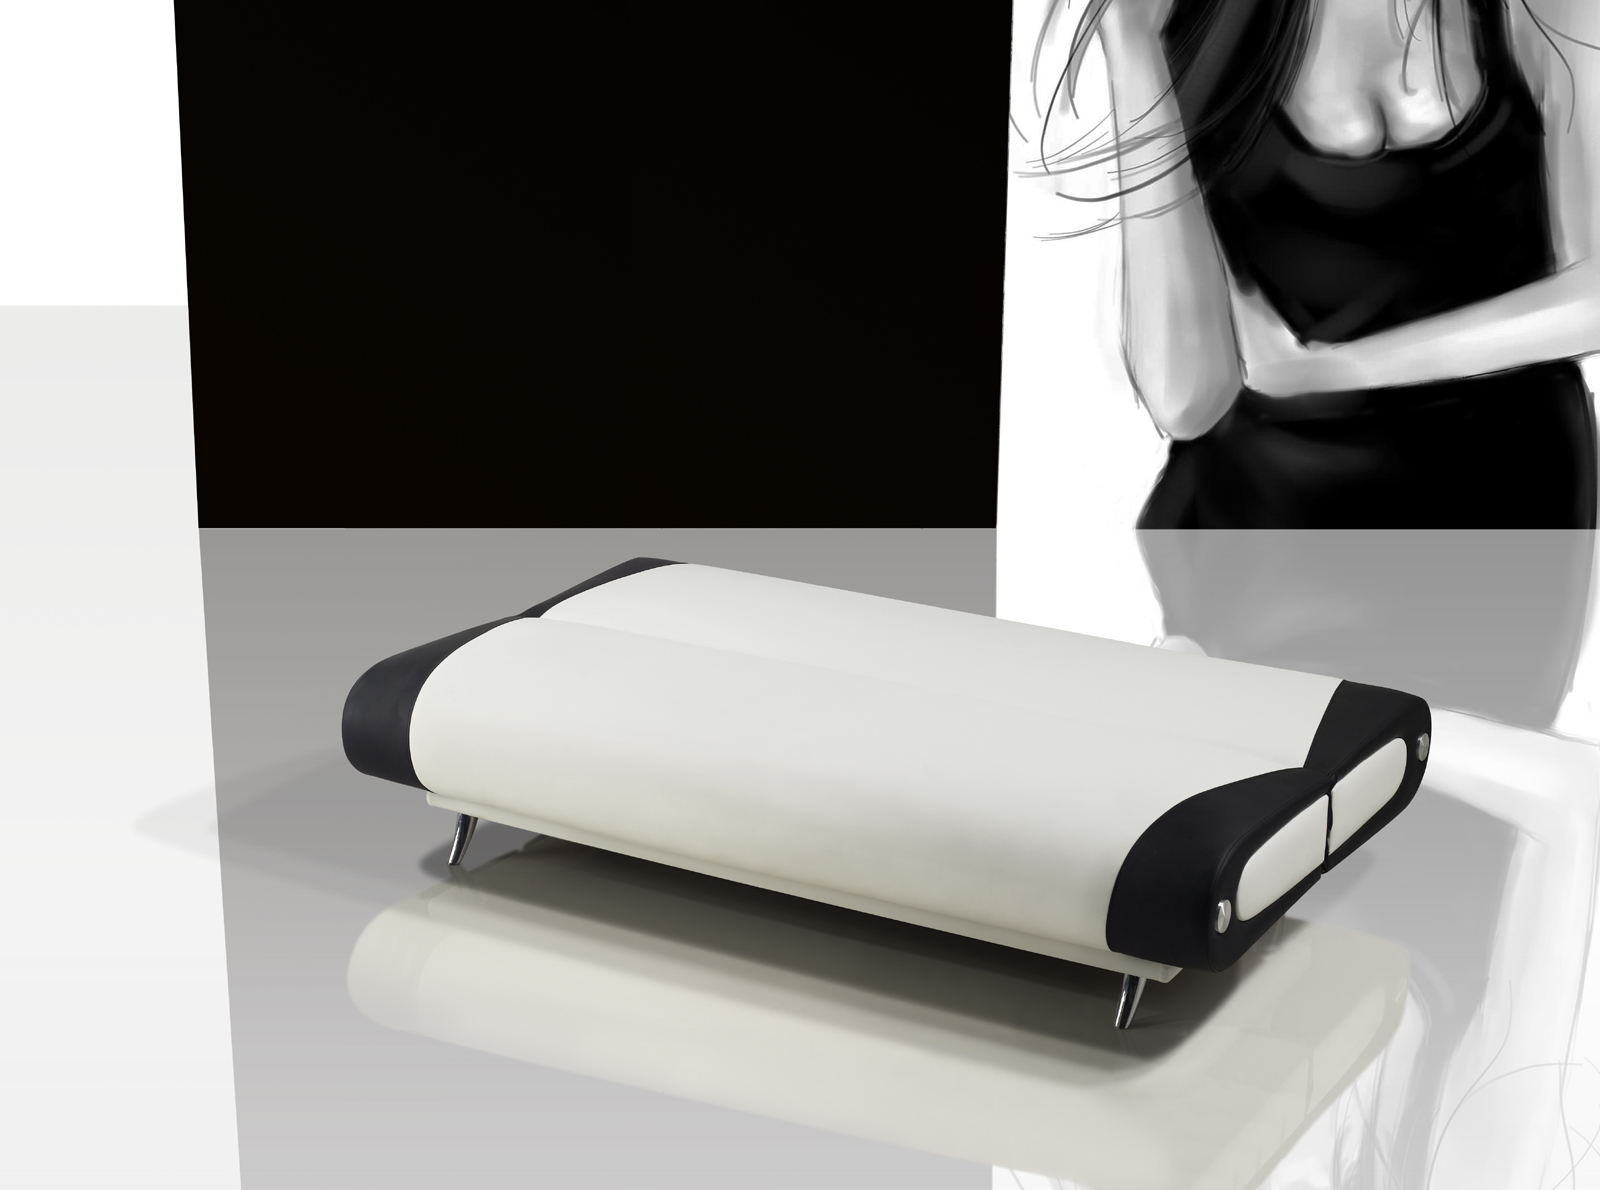 Sam schlafsofa wei schwarz sofa milano 200 cm for Schlafsofa 200 cm